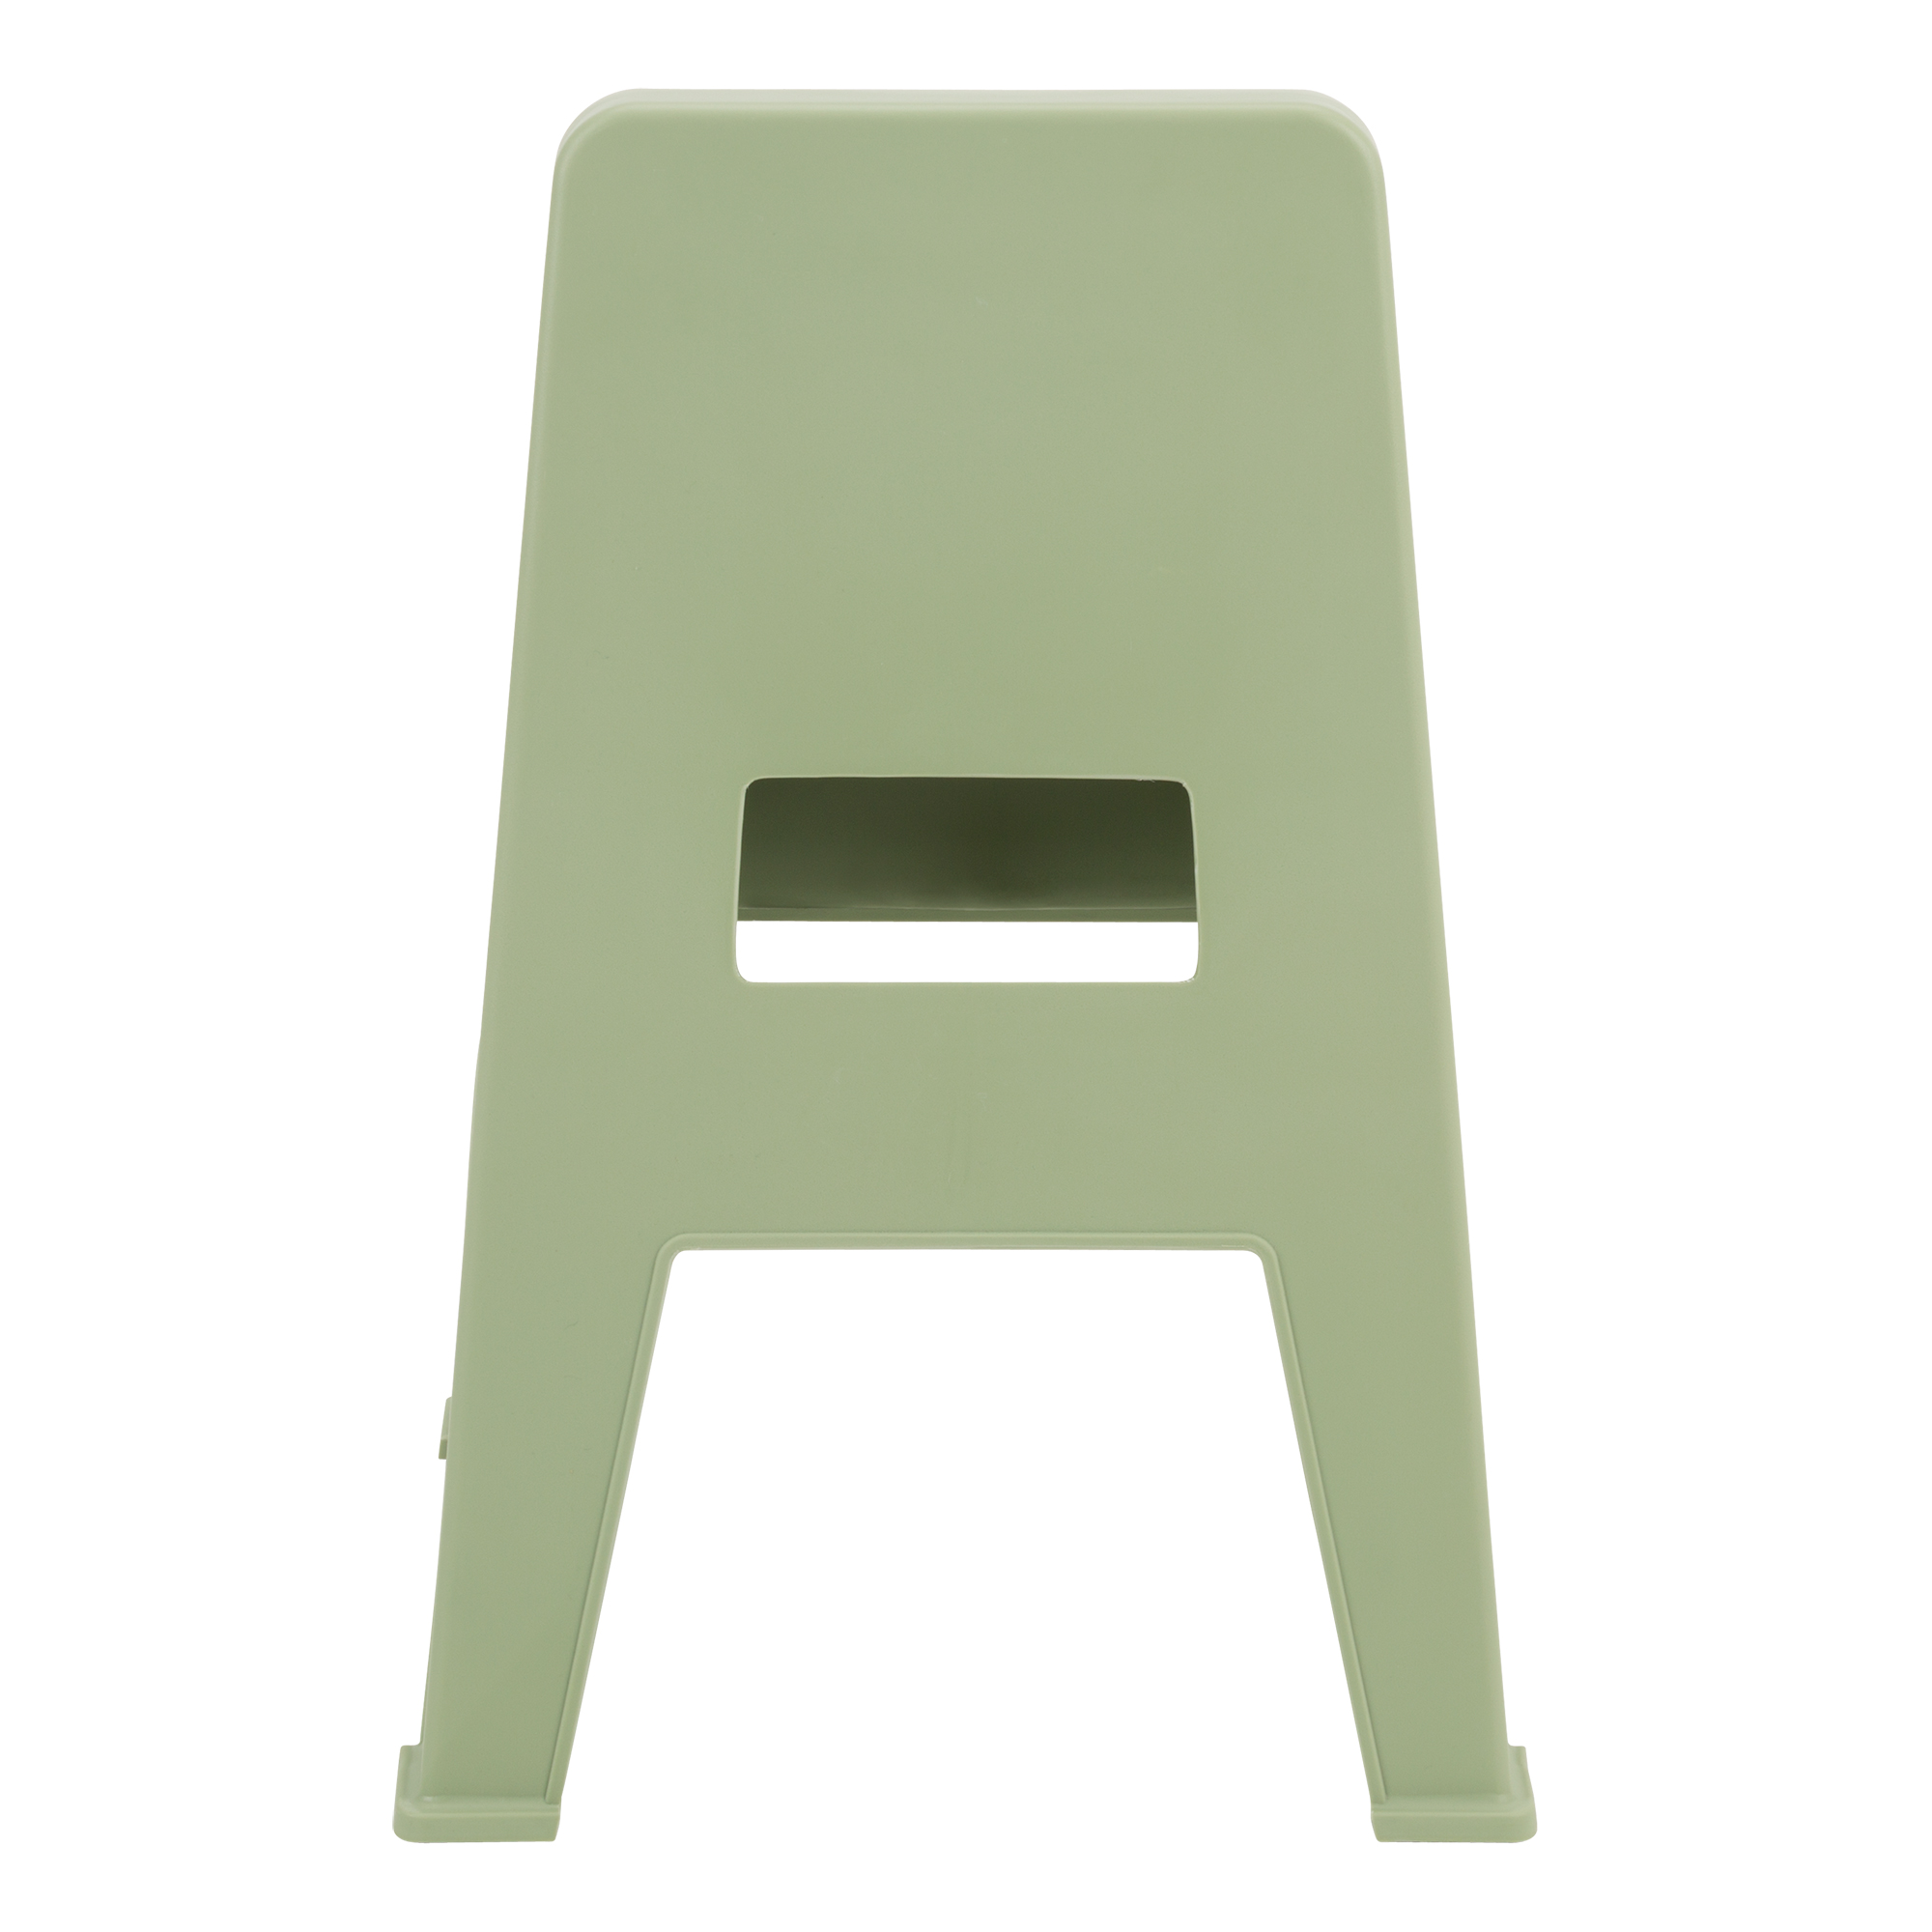 Miraculous Sprogs Nesting Chair Green Pack Of 2 Lamtechconsult Wood Chair Design Ideas Lamtechconsultcom